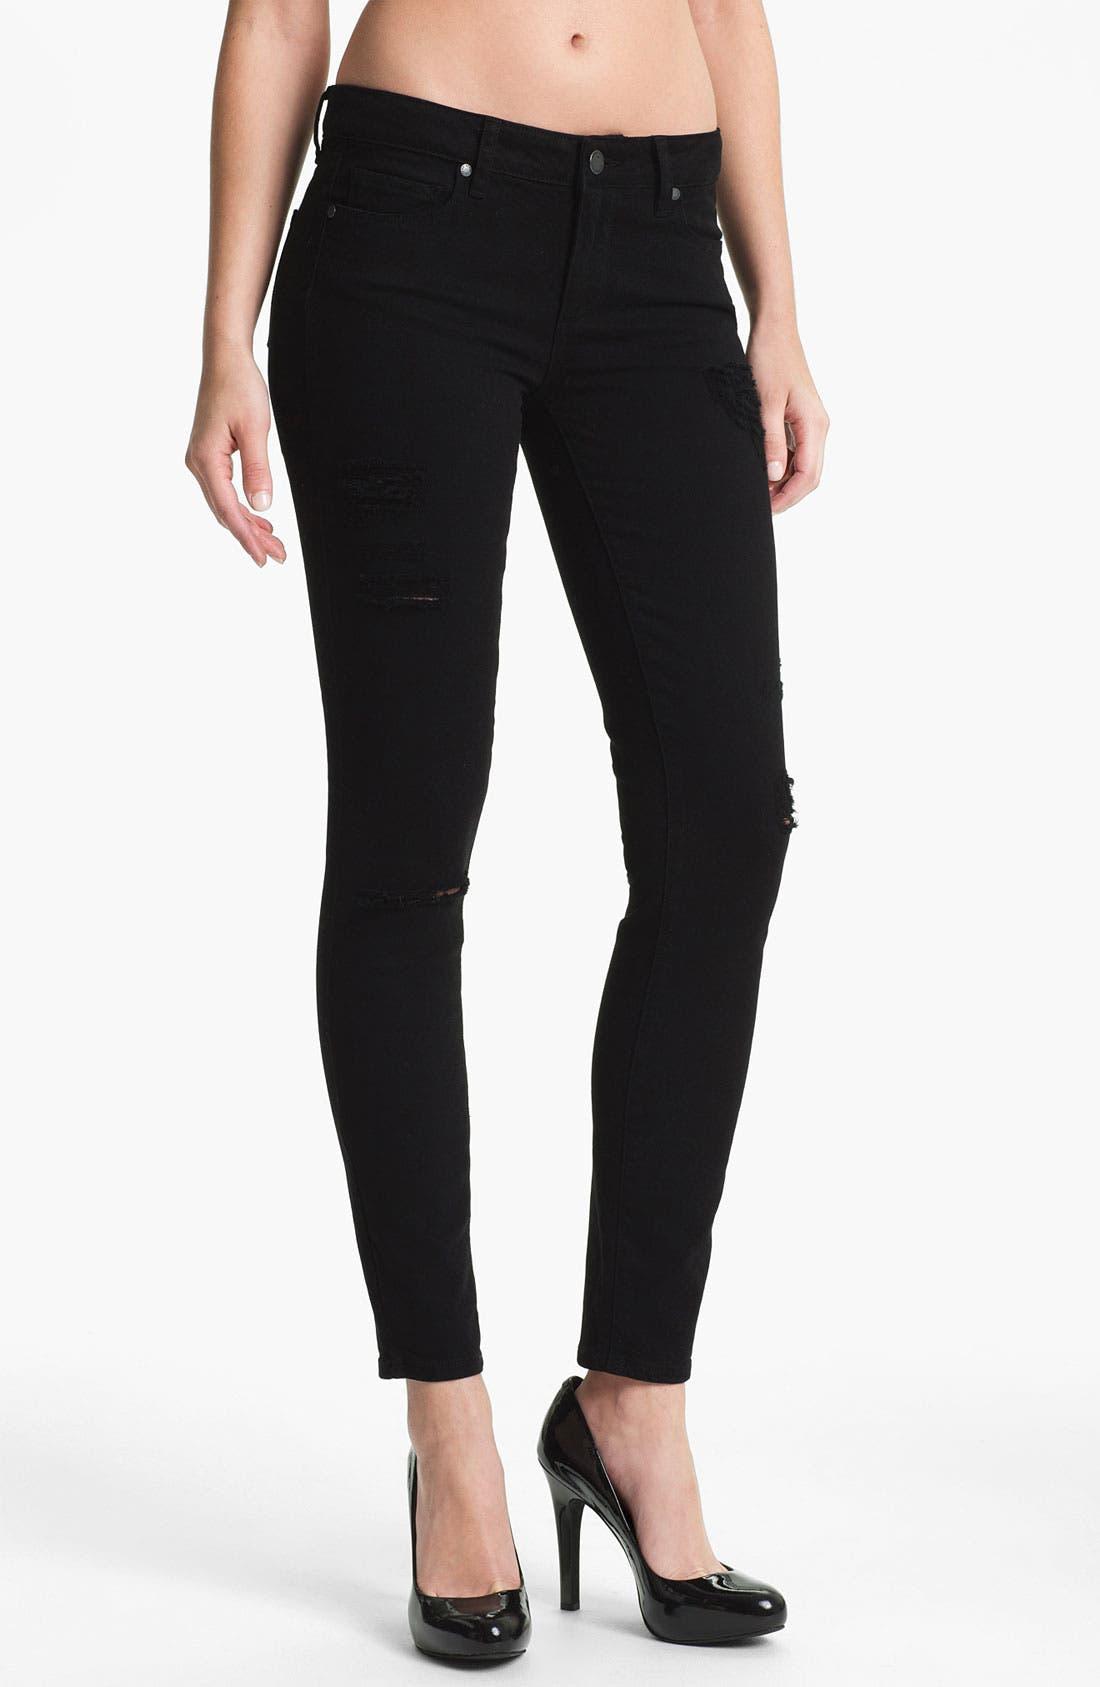 Main Image - Paige Denim 'Verdugo' Stretch Skinny Jeans (Black)